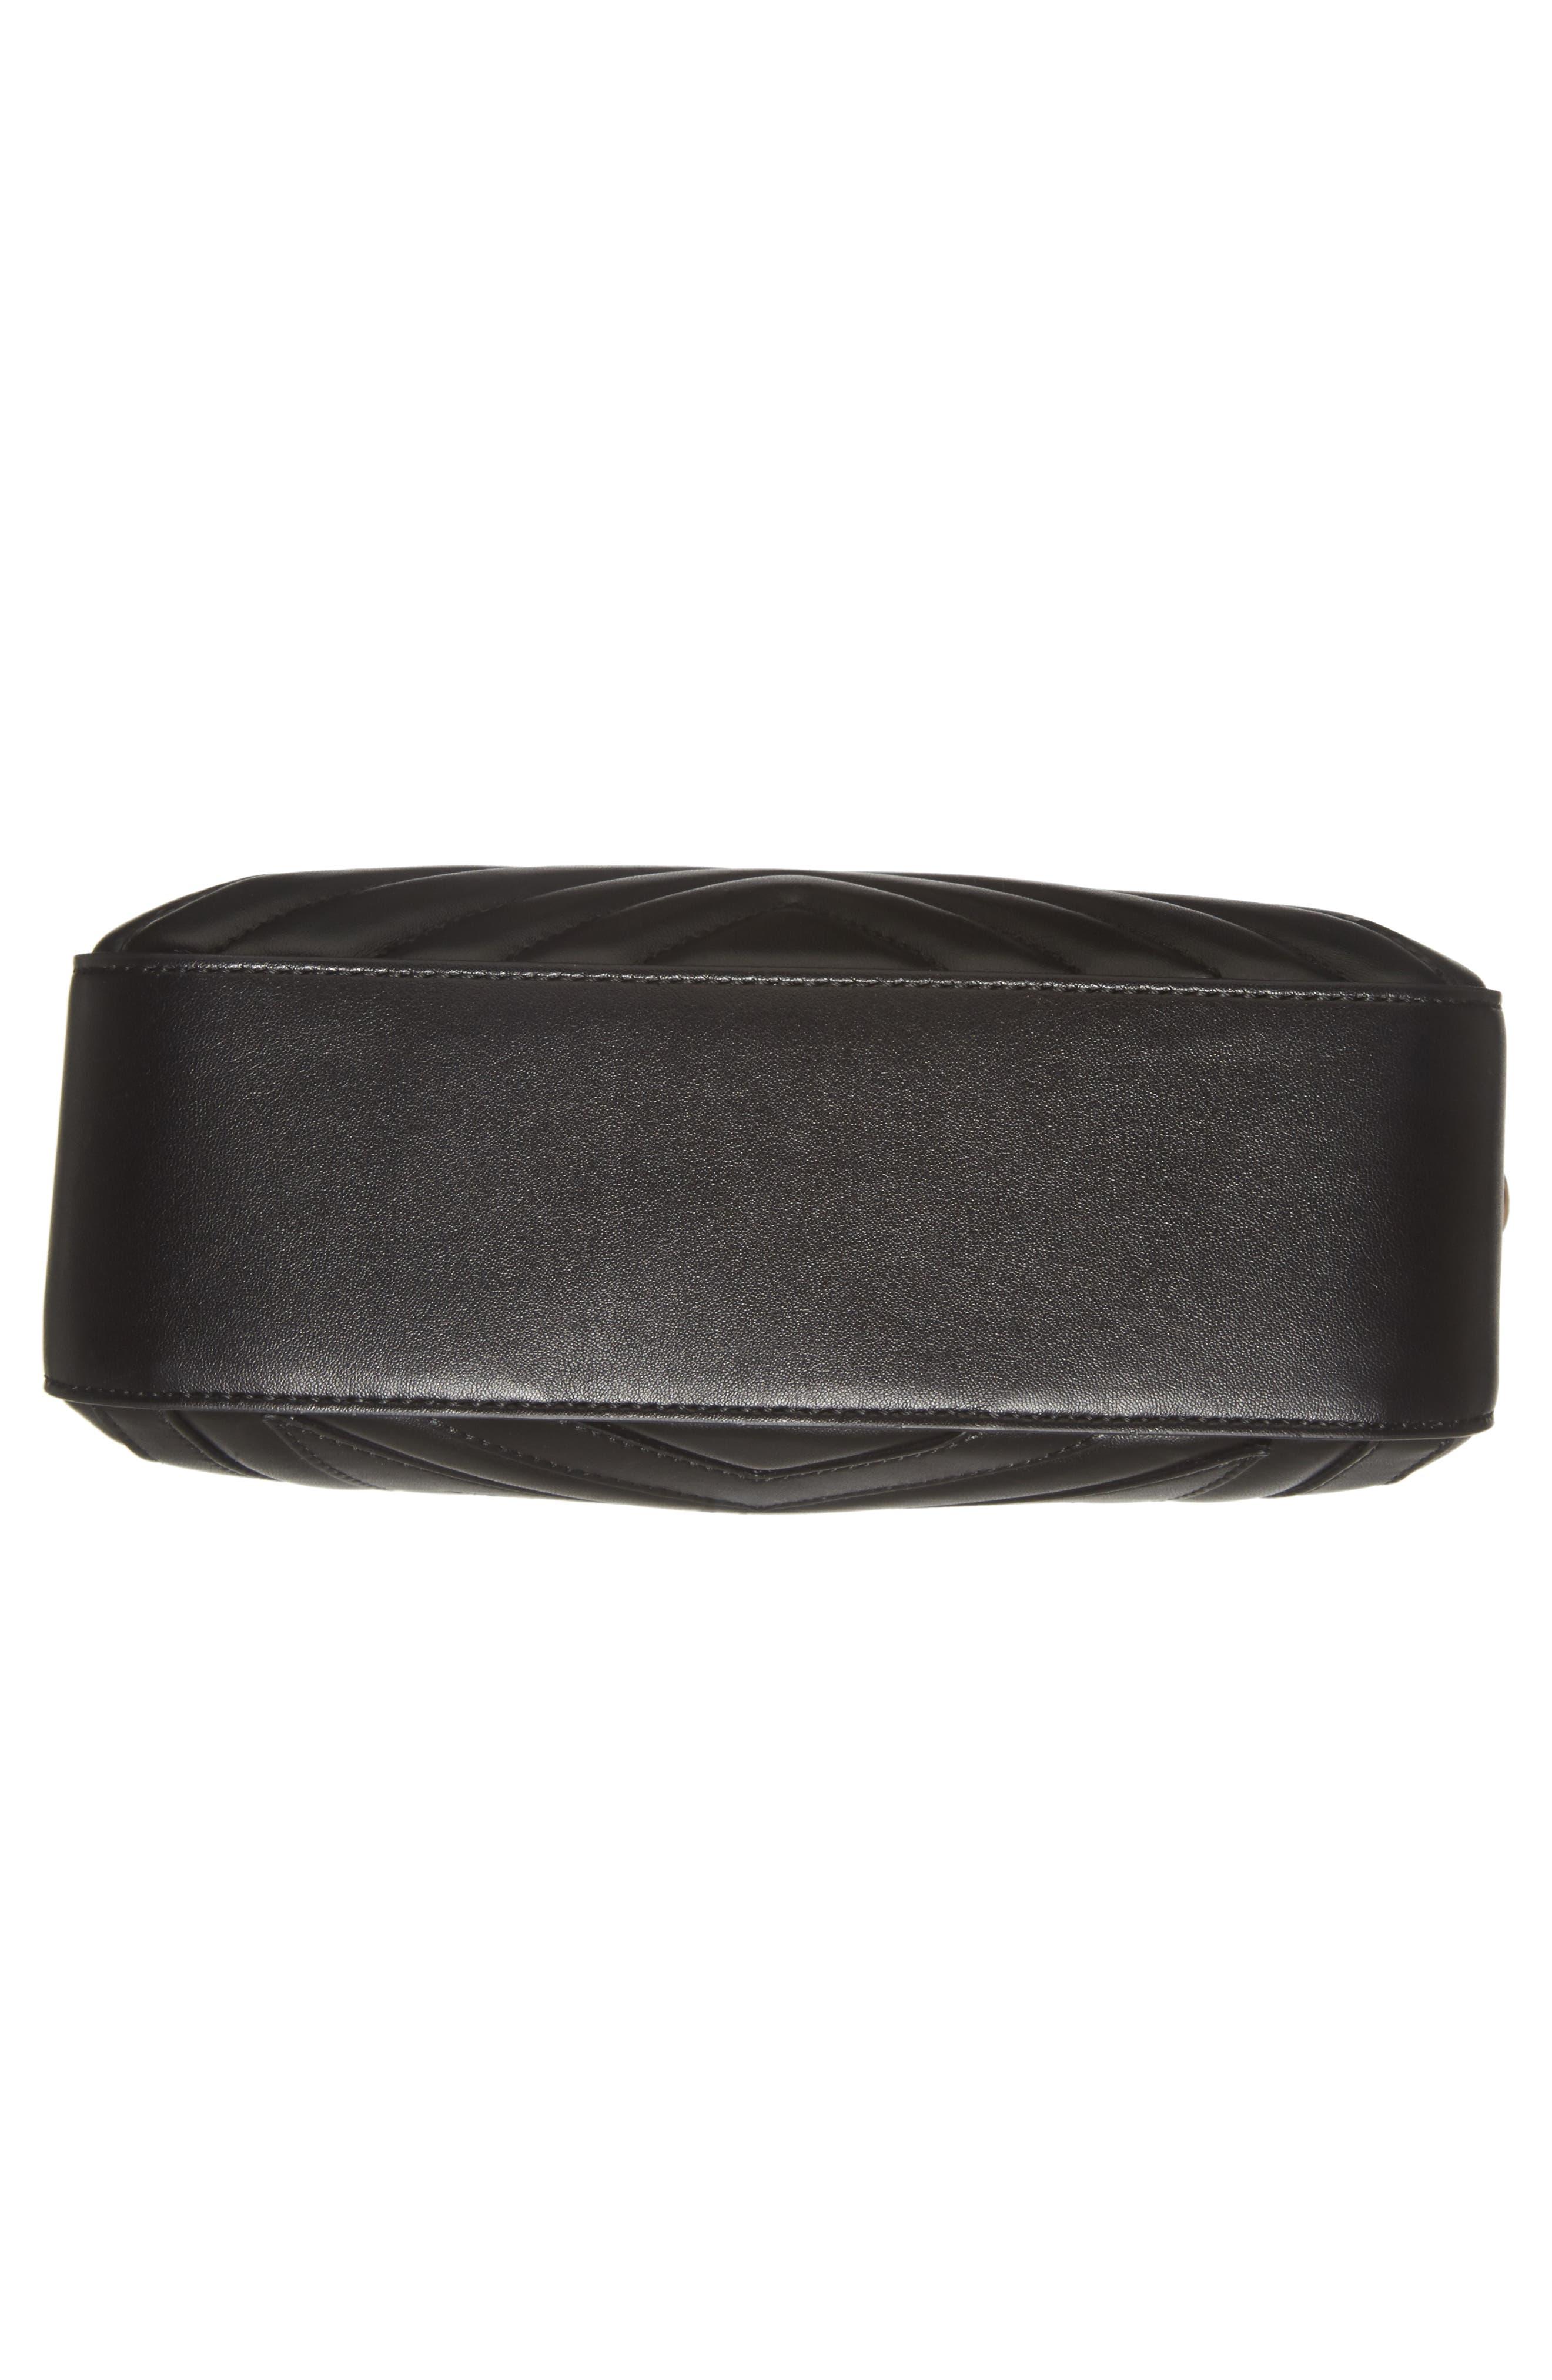 Alter Nappa Faux Leather Shoulder Bag,                             Alternate thumbnail 6, color,                             BLACK